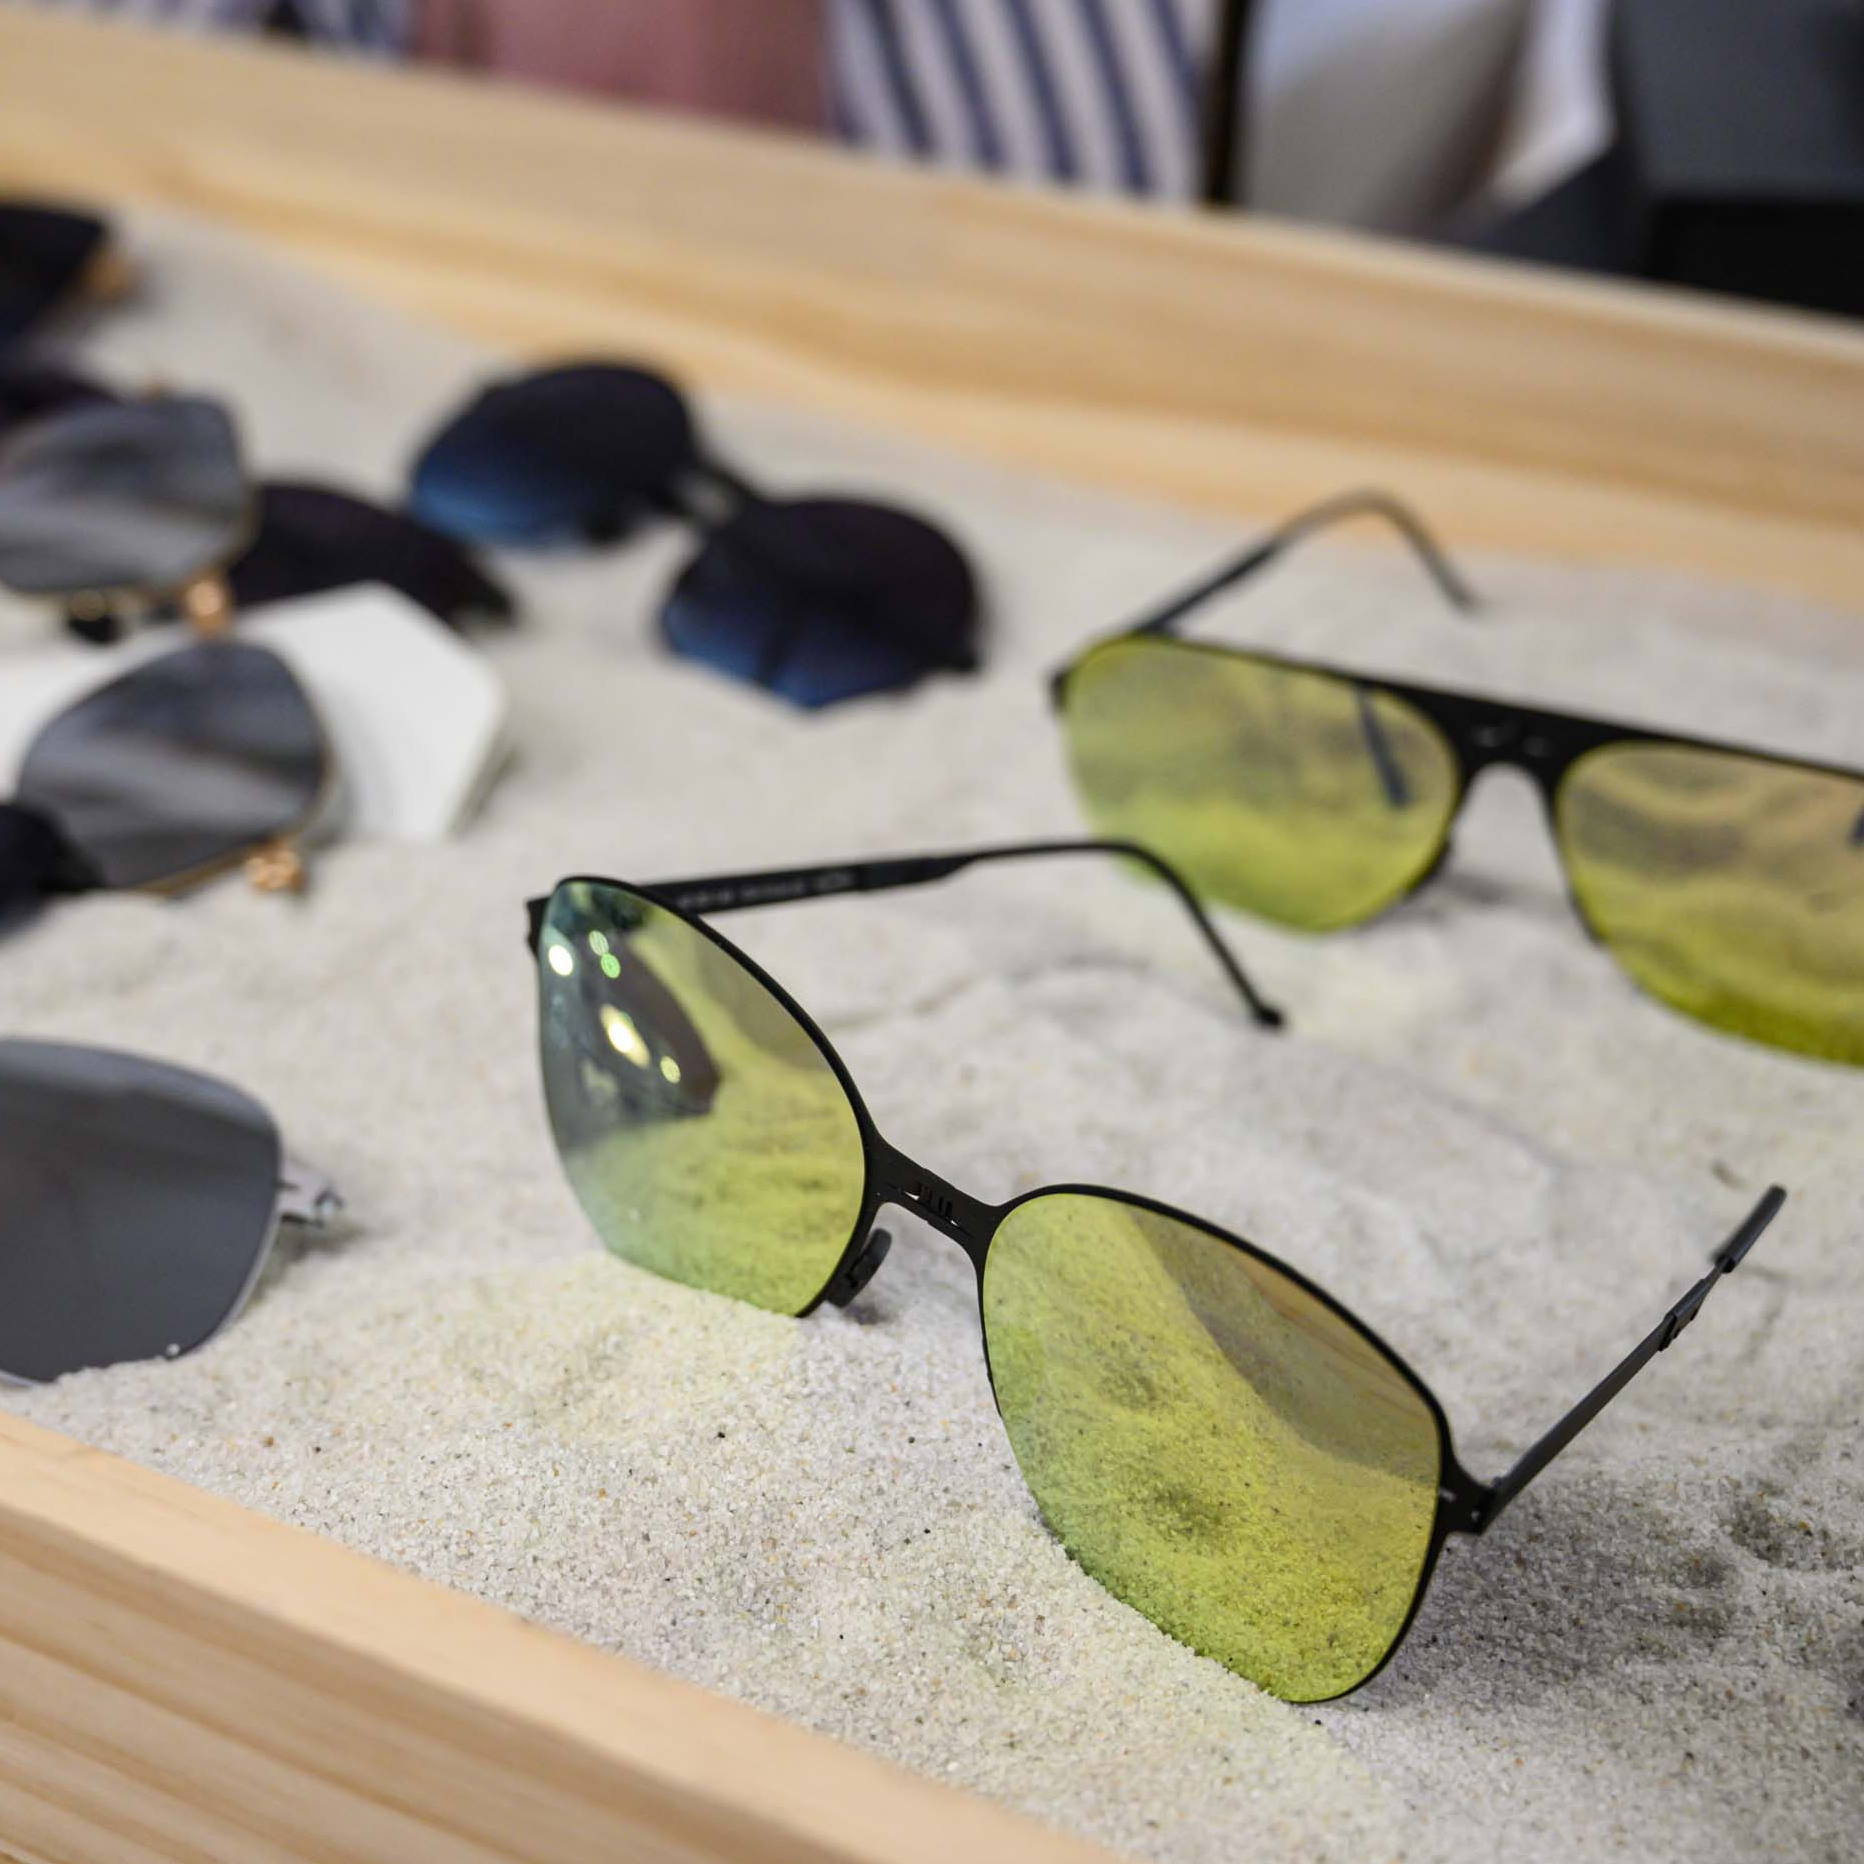 <p>時尚折疊太陽眼鏡 ROAV 2019 年春夏系列輕薄登場</p>